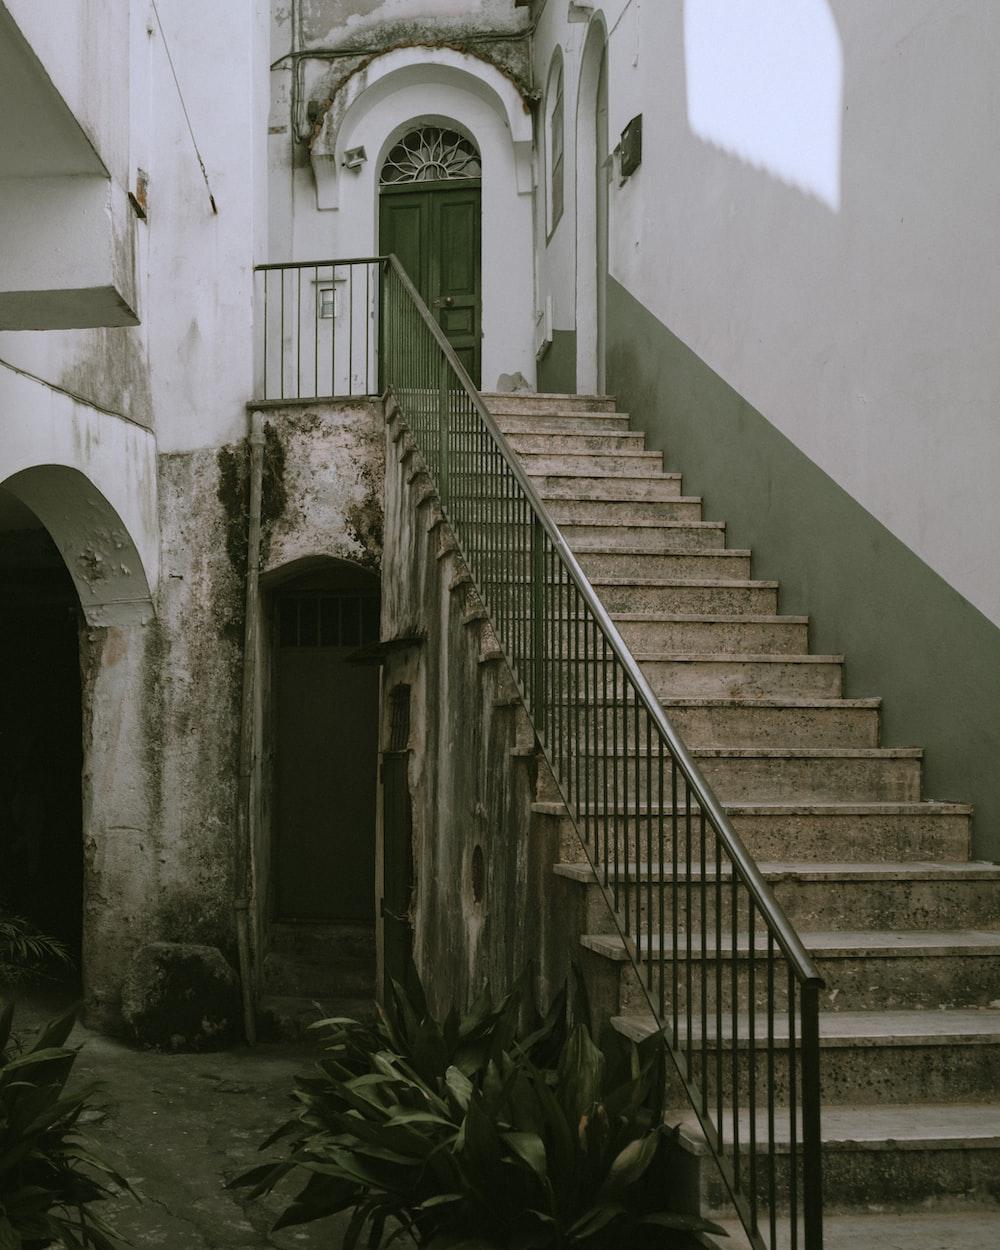 black metal staircase near white concrete building